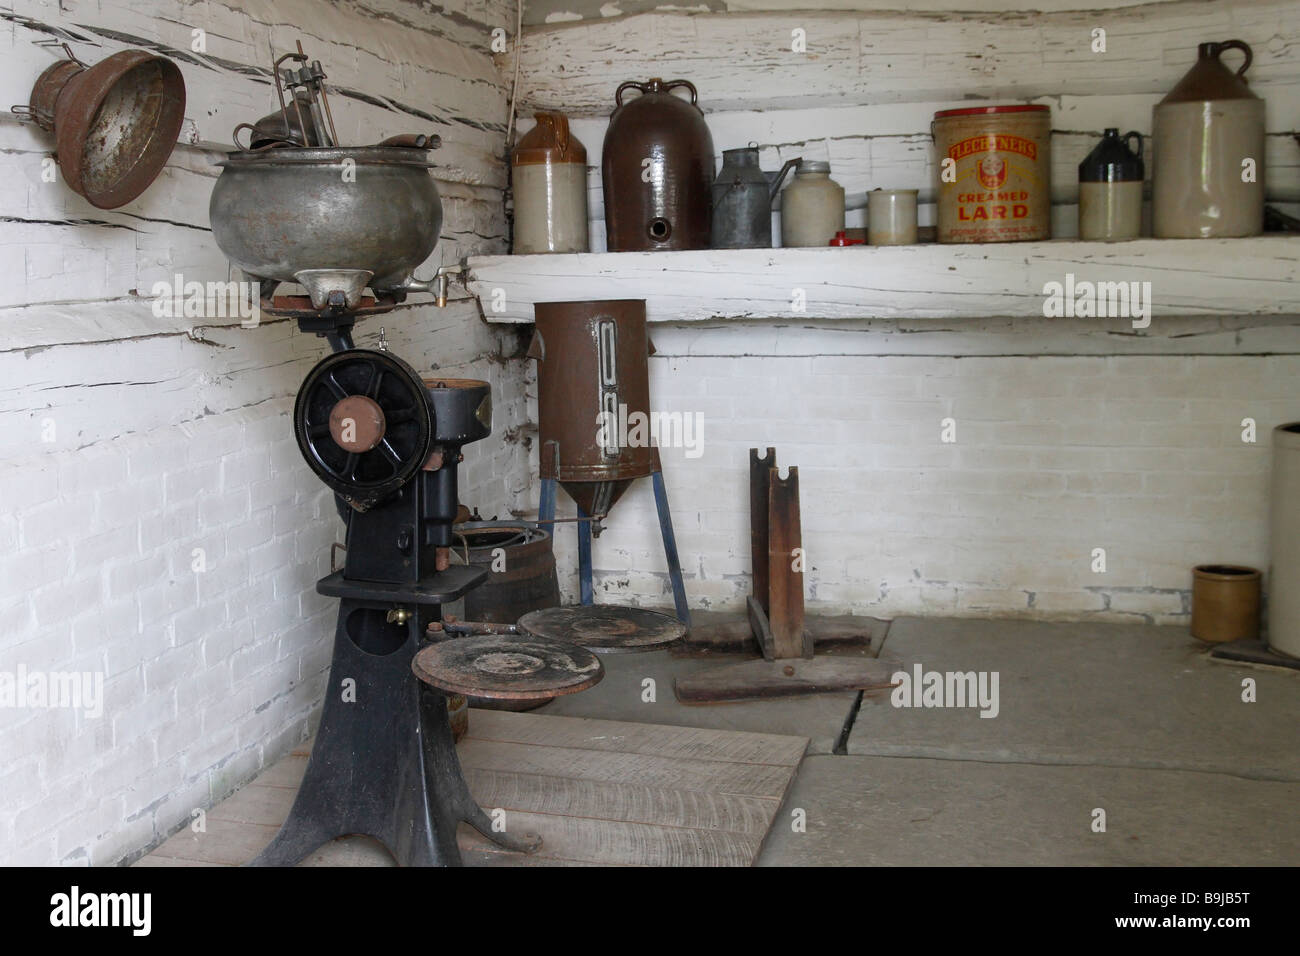 Crafting And Craft Stockfotos & Crafting And Craft Bilder - Alamy